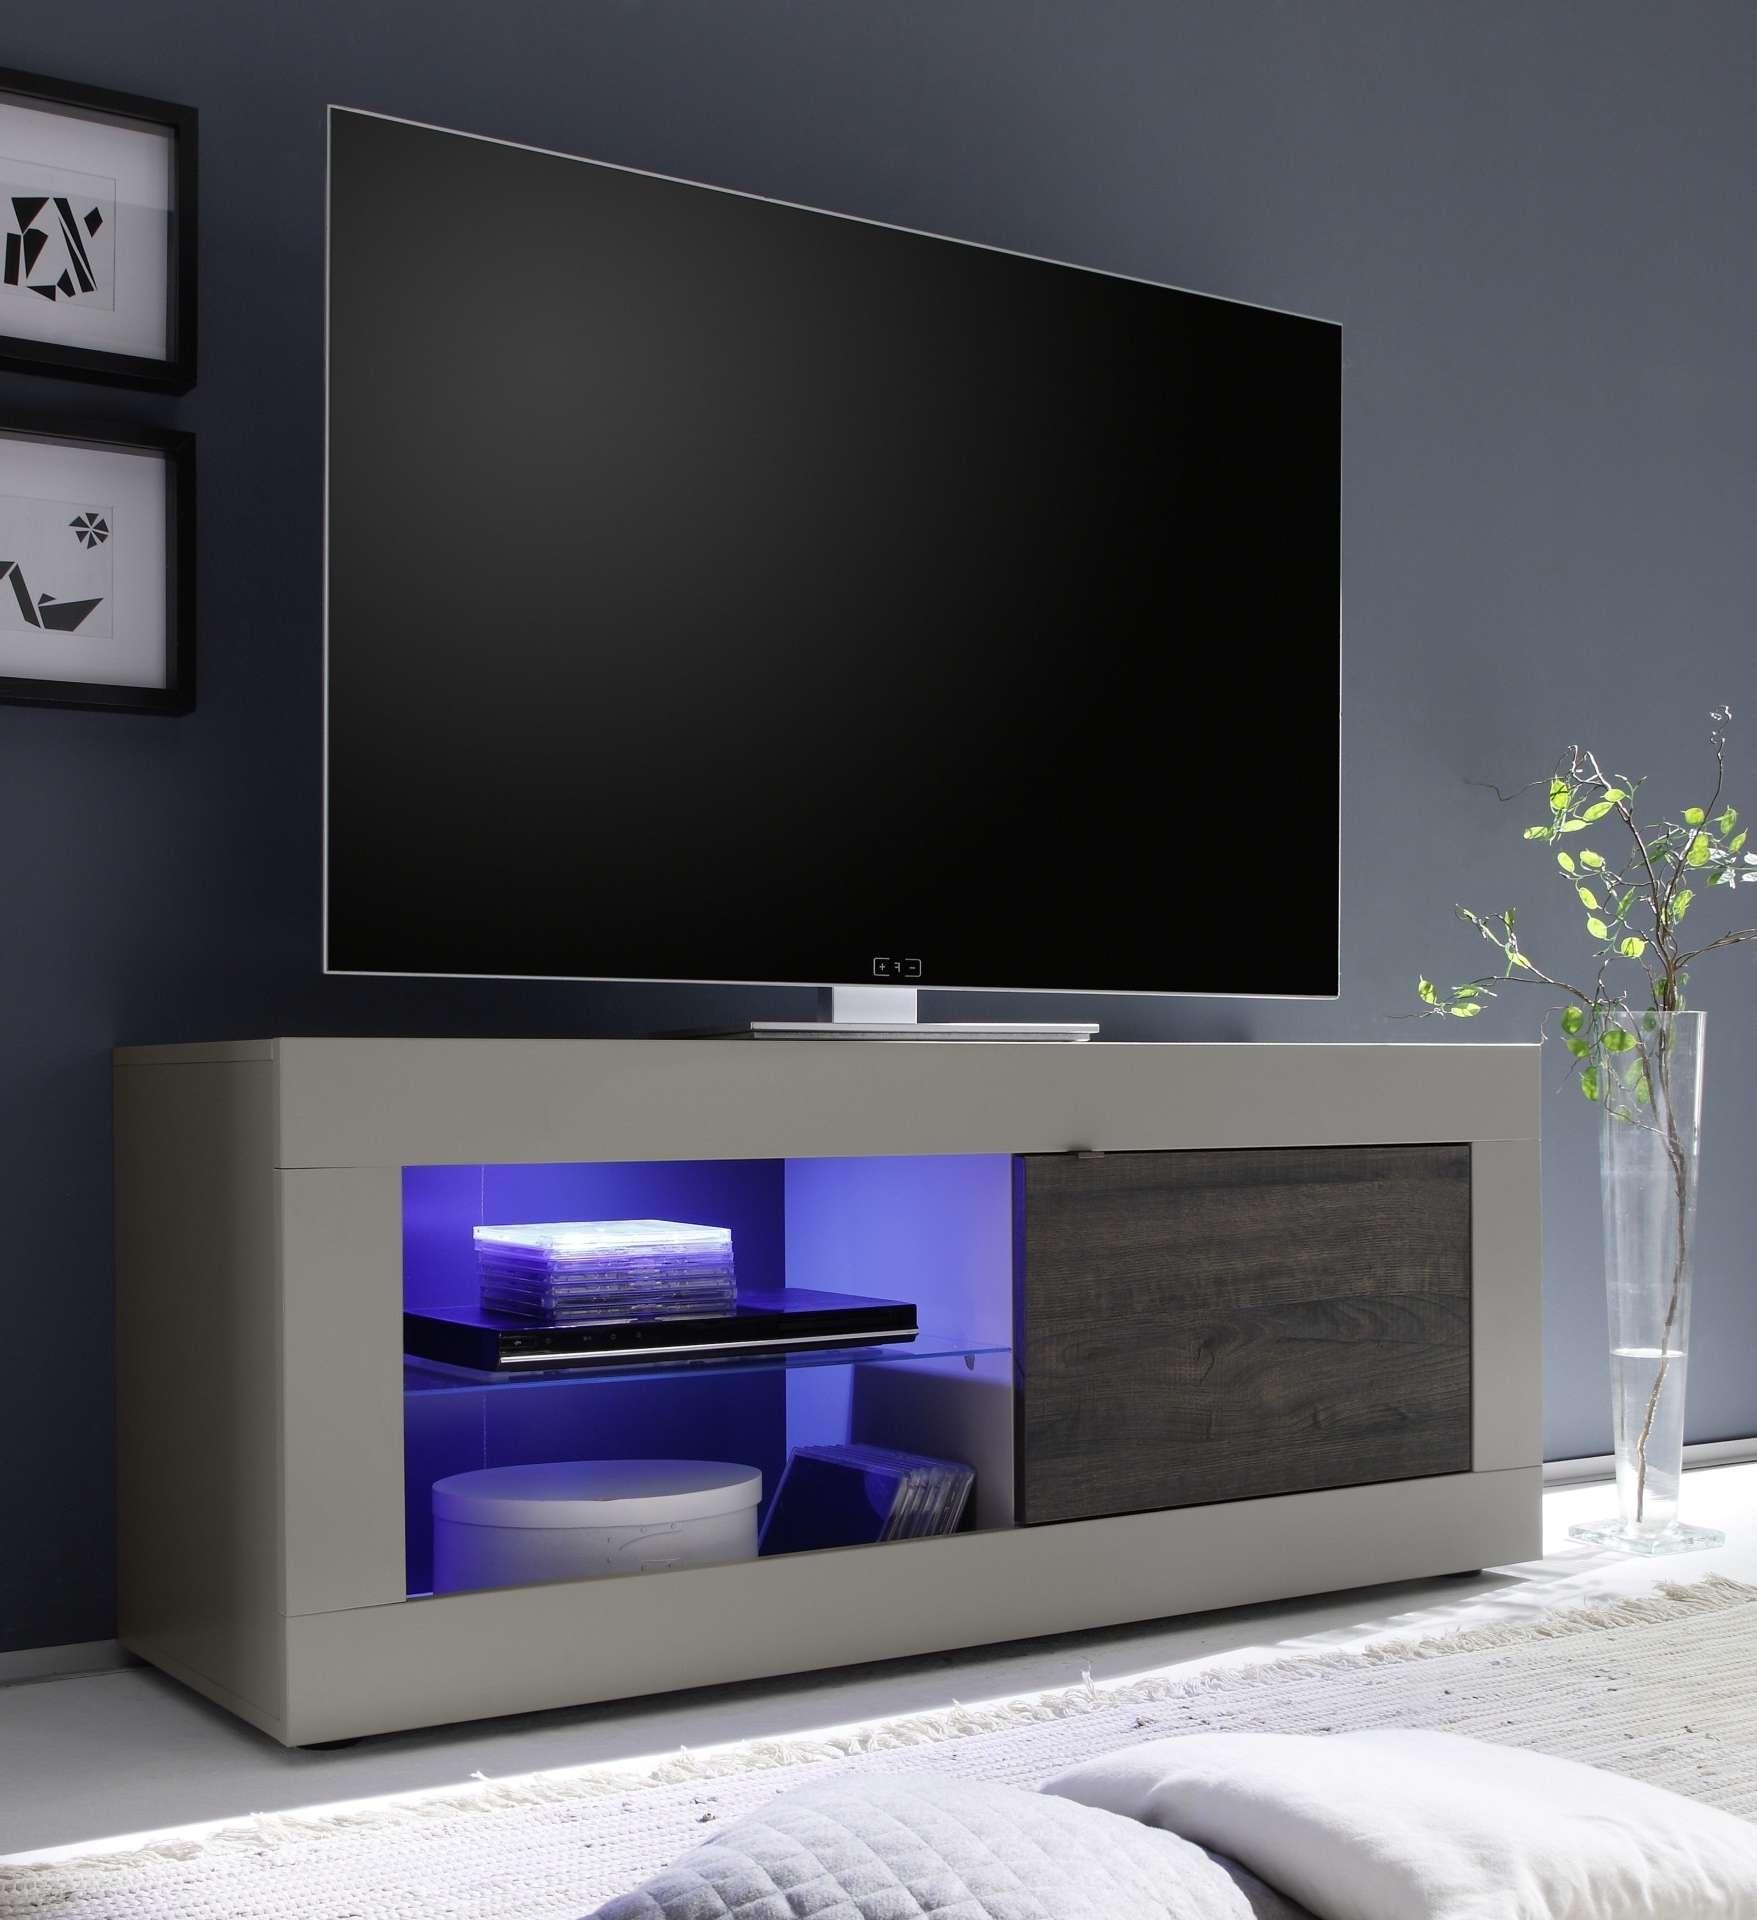 Dolcevita Matt Beige Tv Stand – Tv Stands – Sena Home Furniture Inside Funky Tv Stands (View 3 of 15)